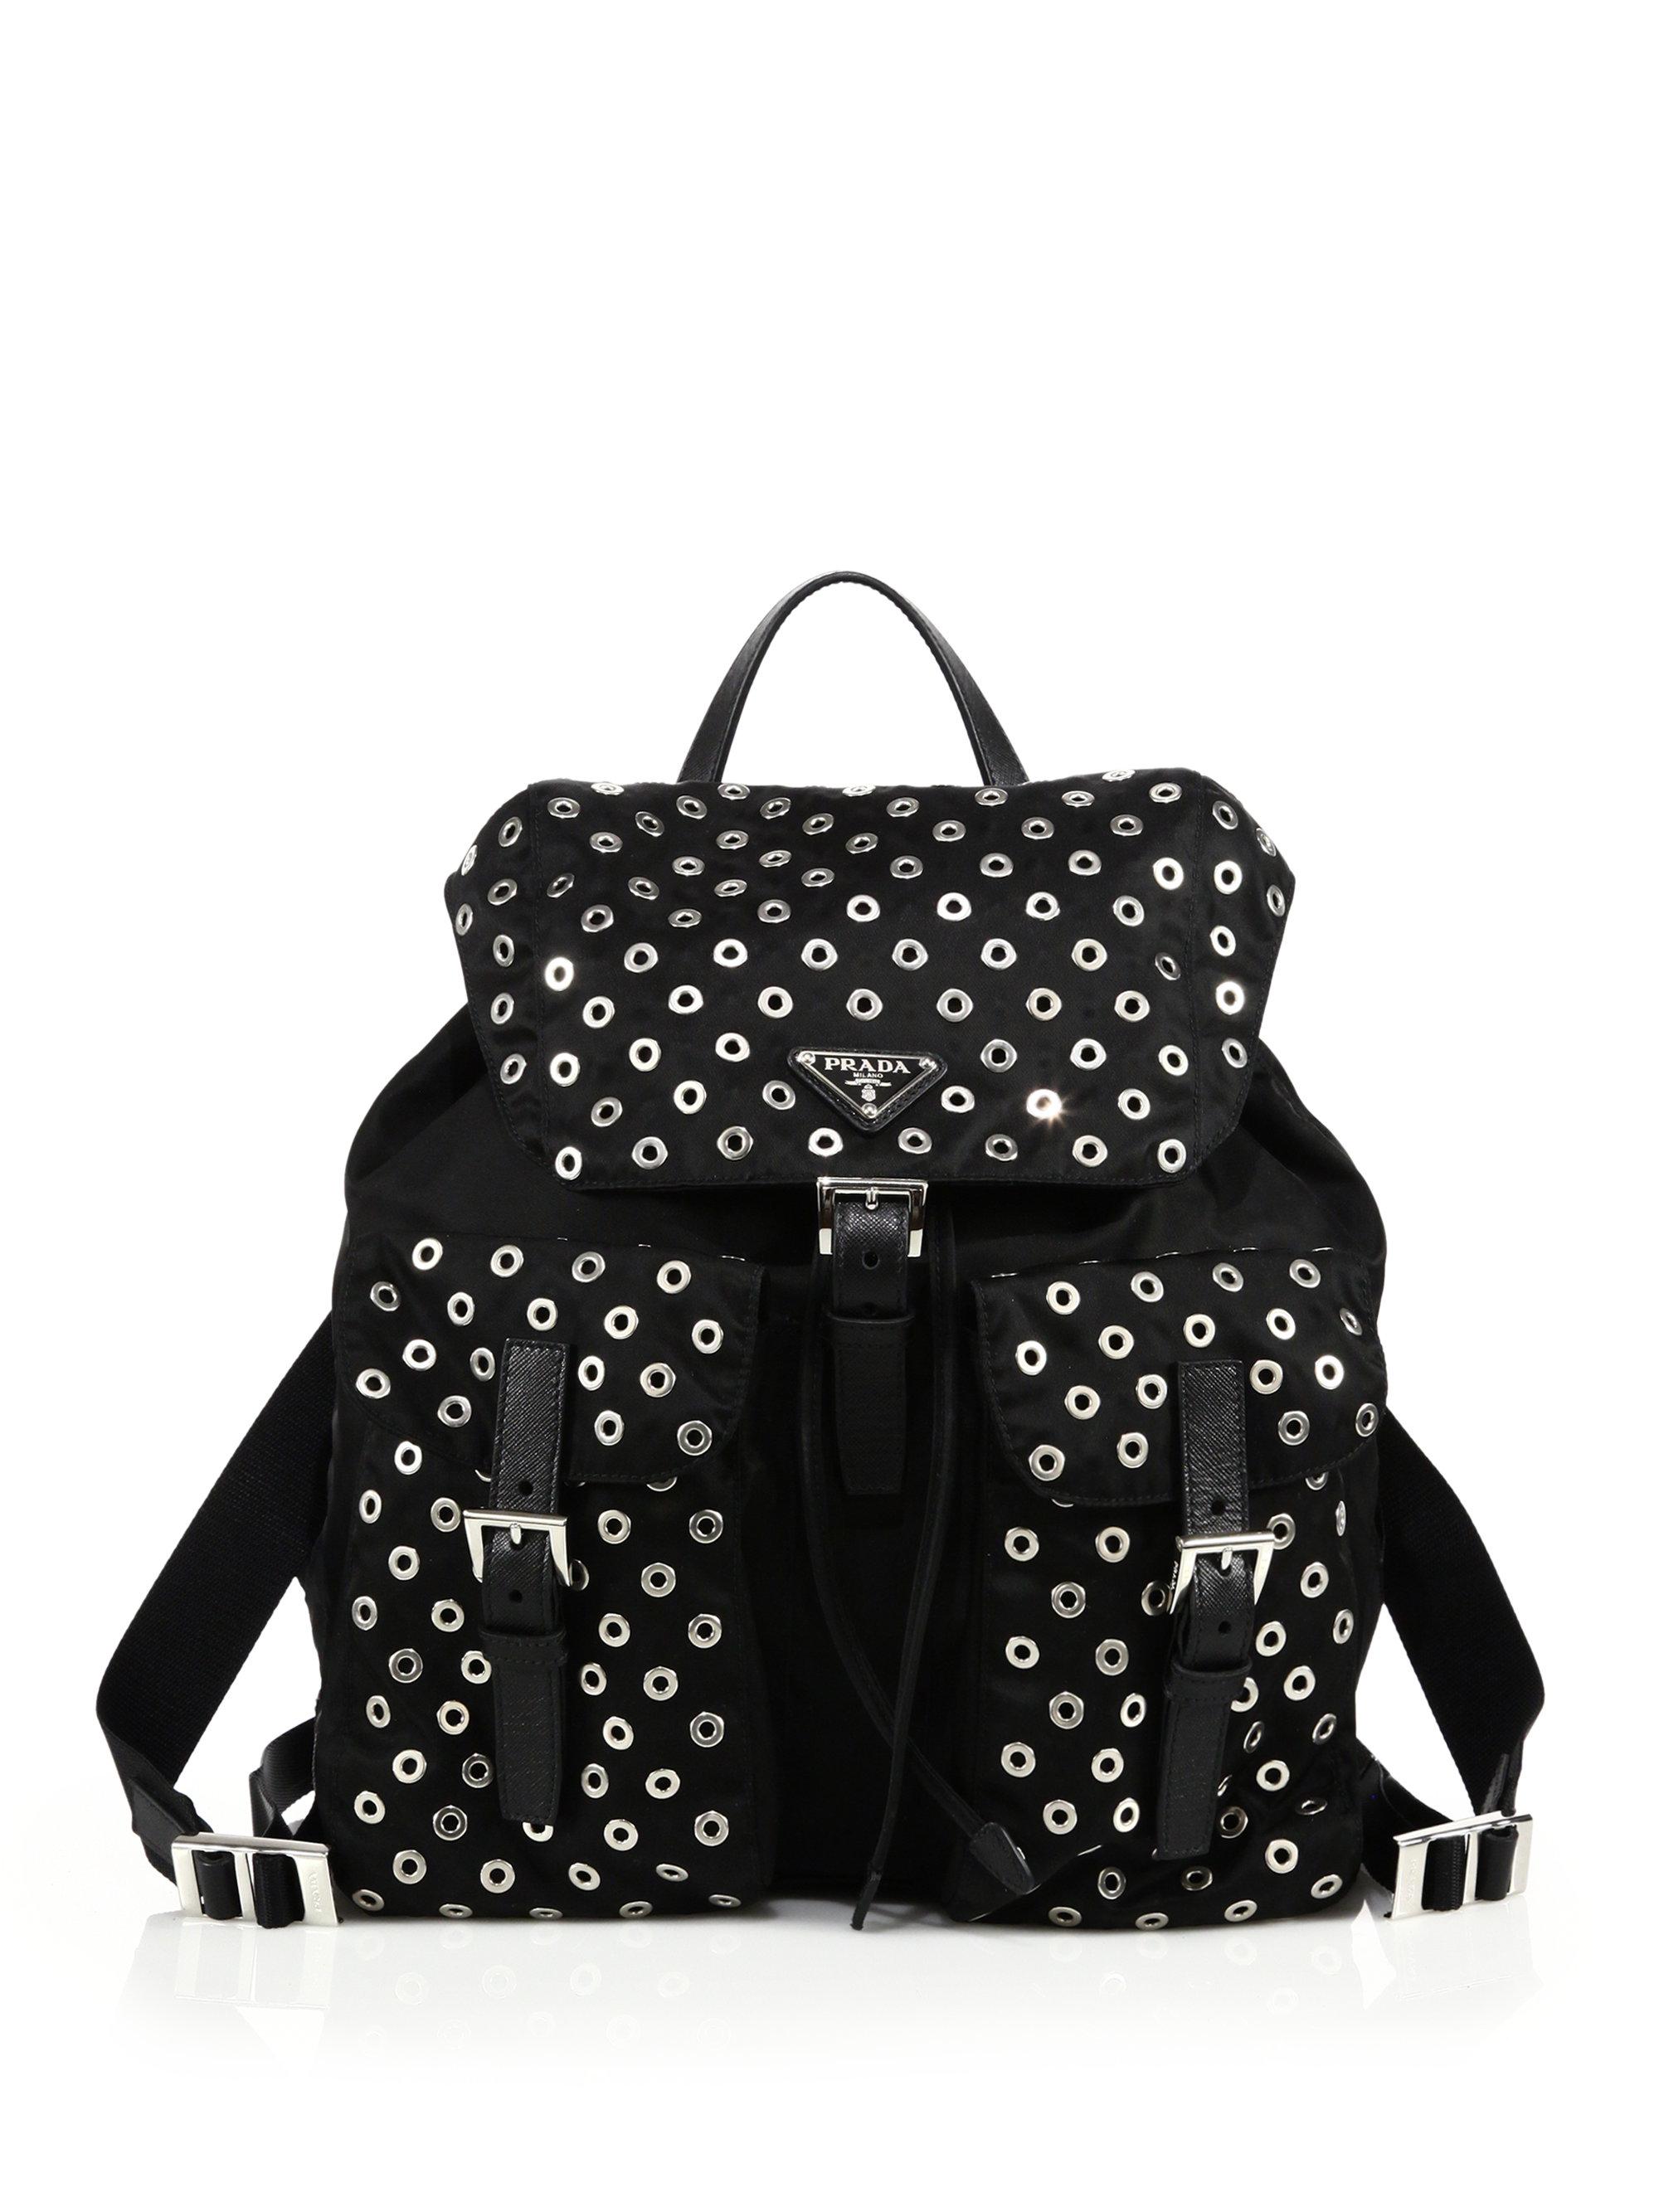 Prada Grommeted Nylon Backpack in Black | Lyst